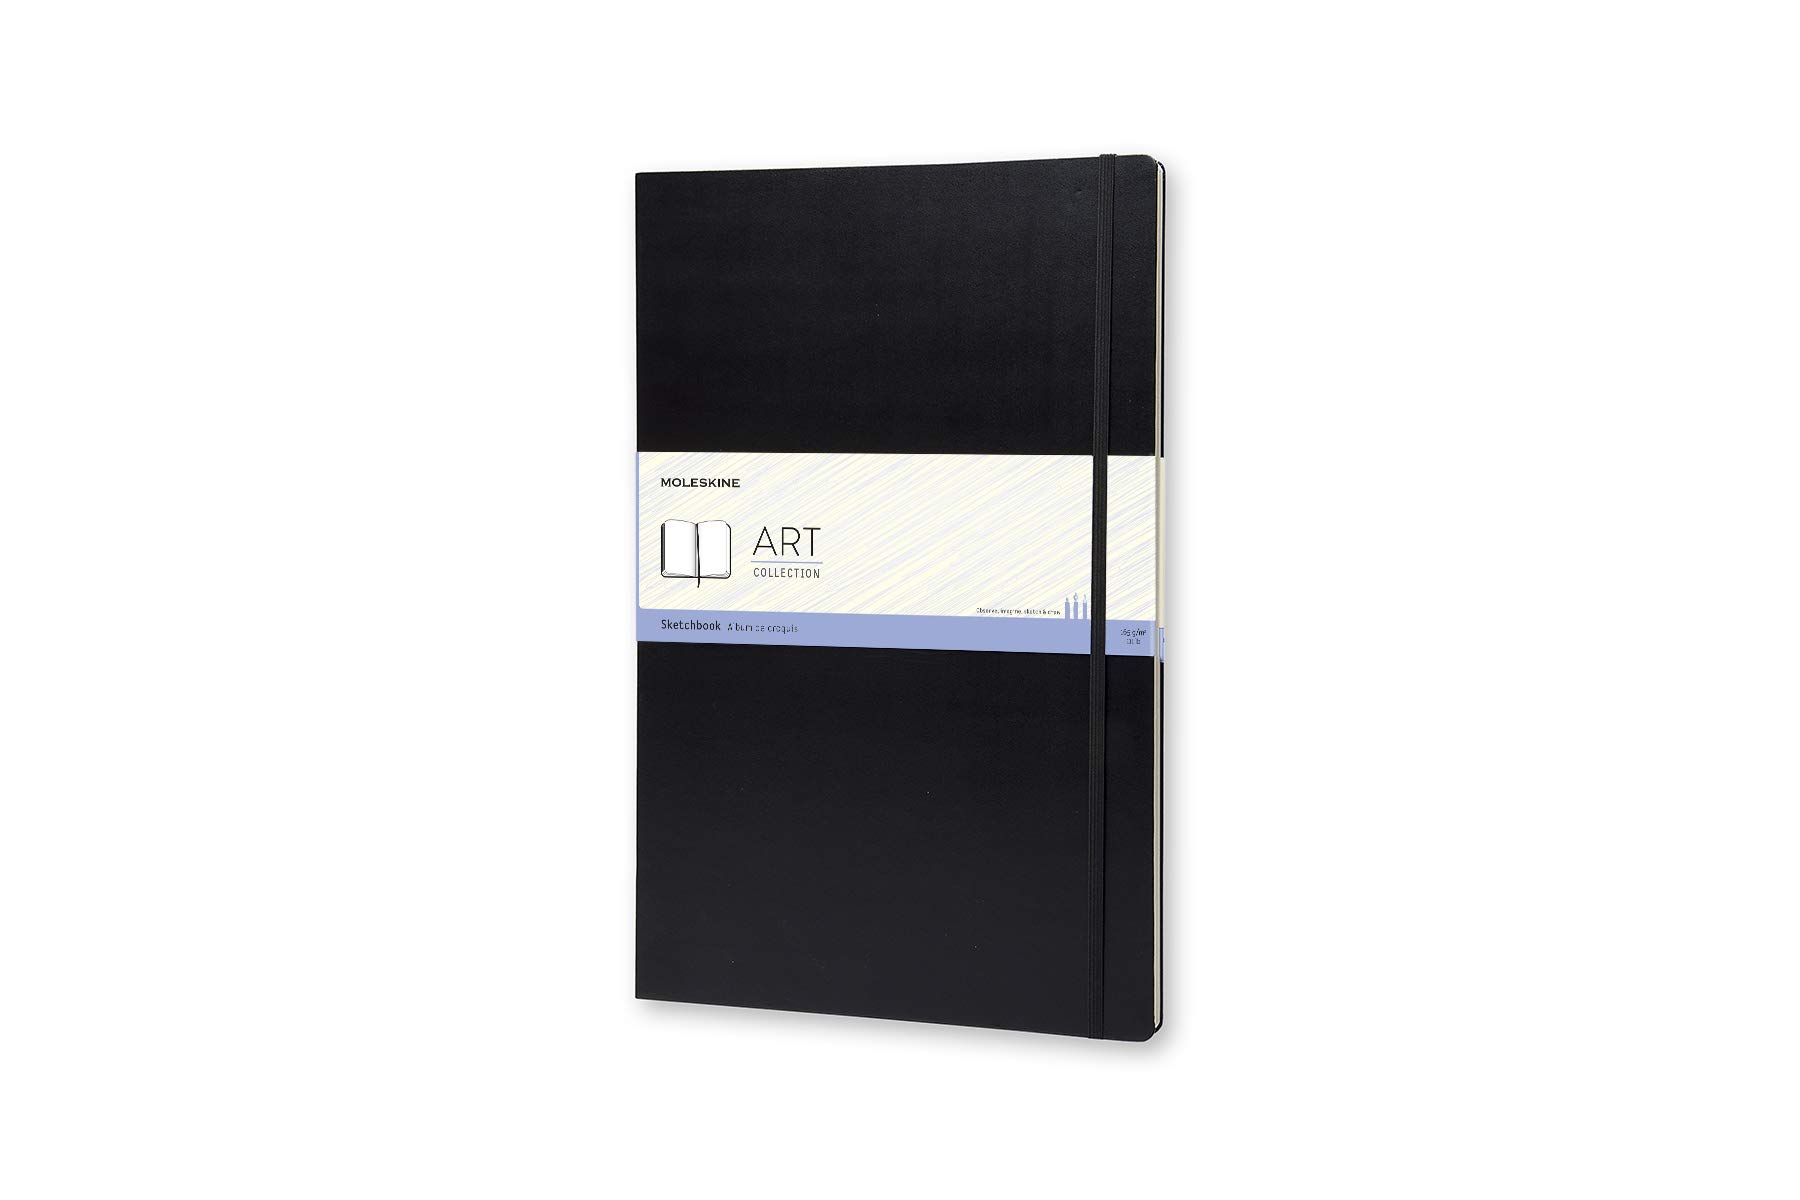 Moleskine Art Sketchbook, Hard Cover, A3 (11.75'' x 16.5'') Plain/Blank, Black by Moleskine